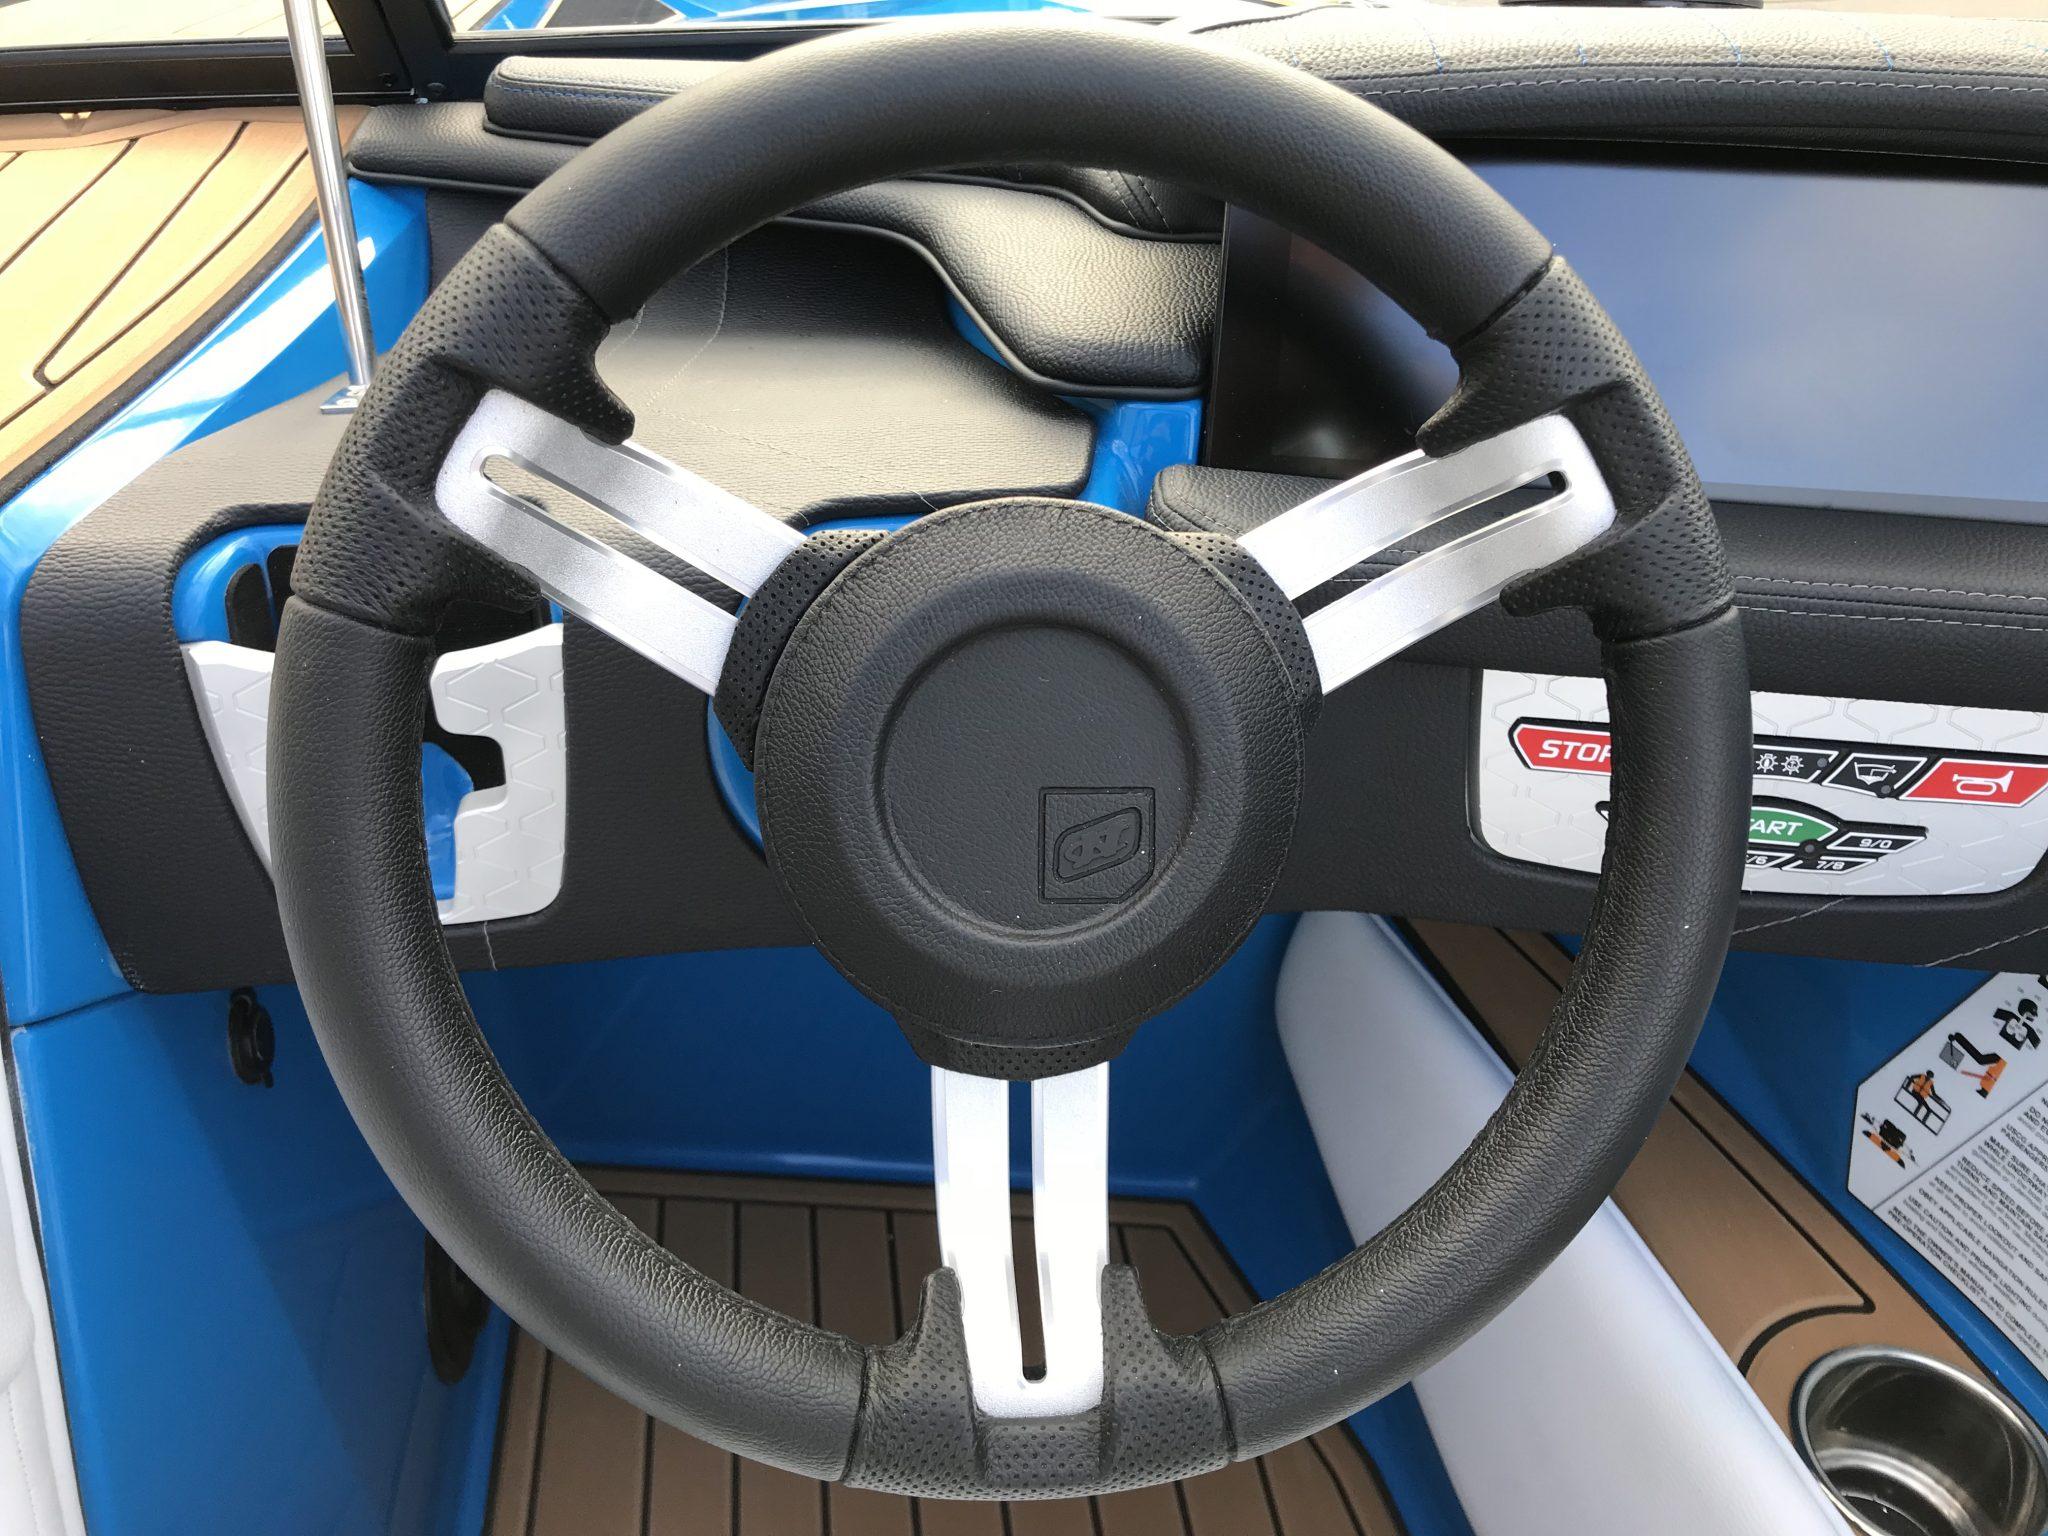 2019 Ski Nautique Steering Wheel